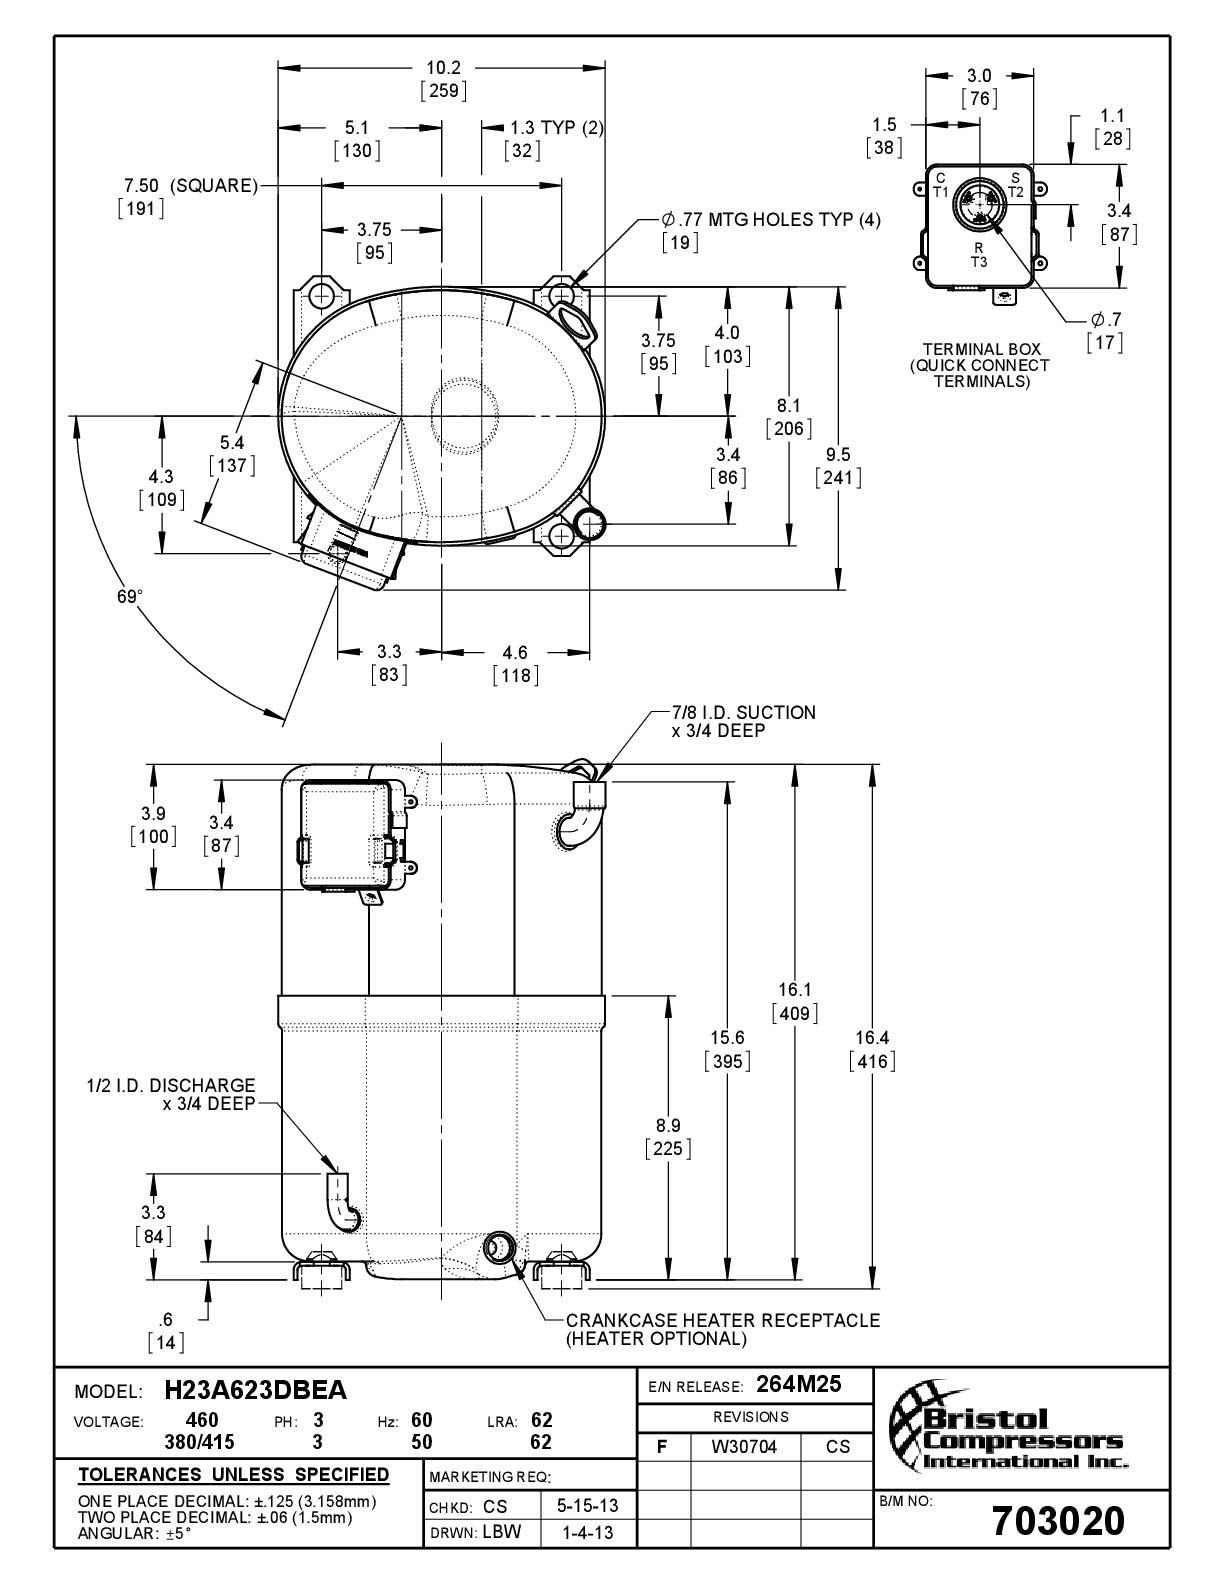 Bristol H23A623DBEA характеристики